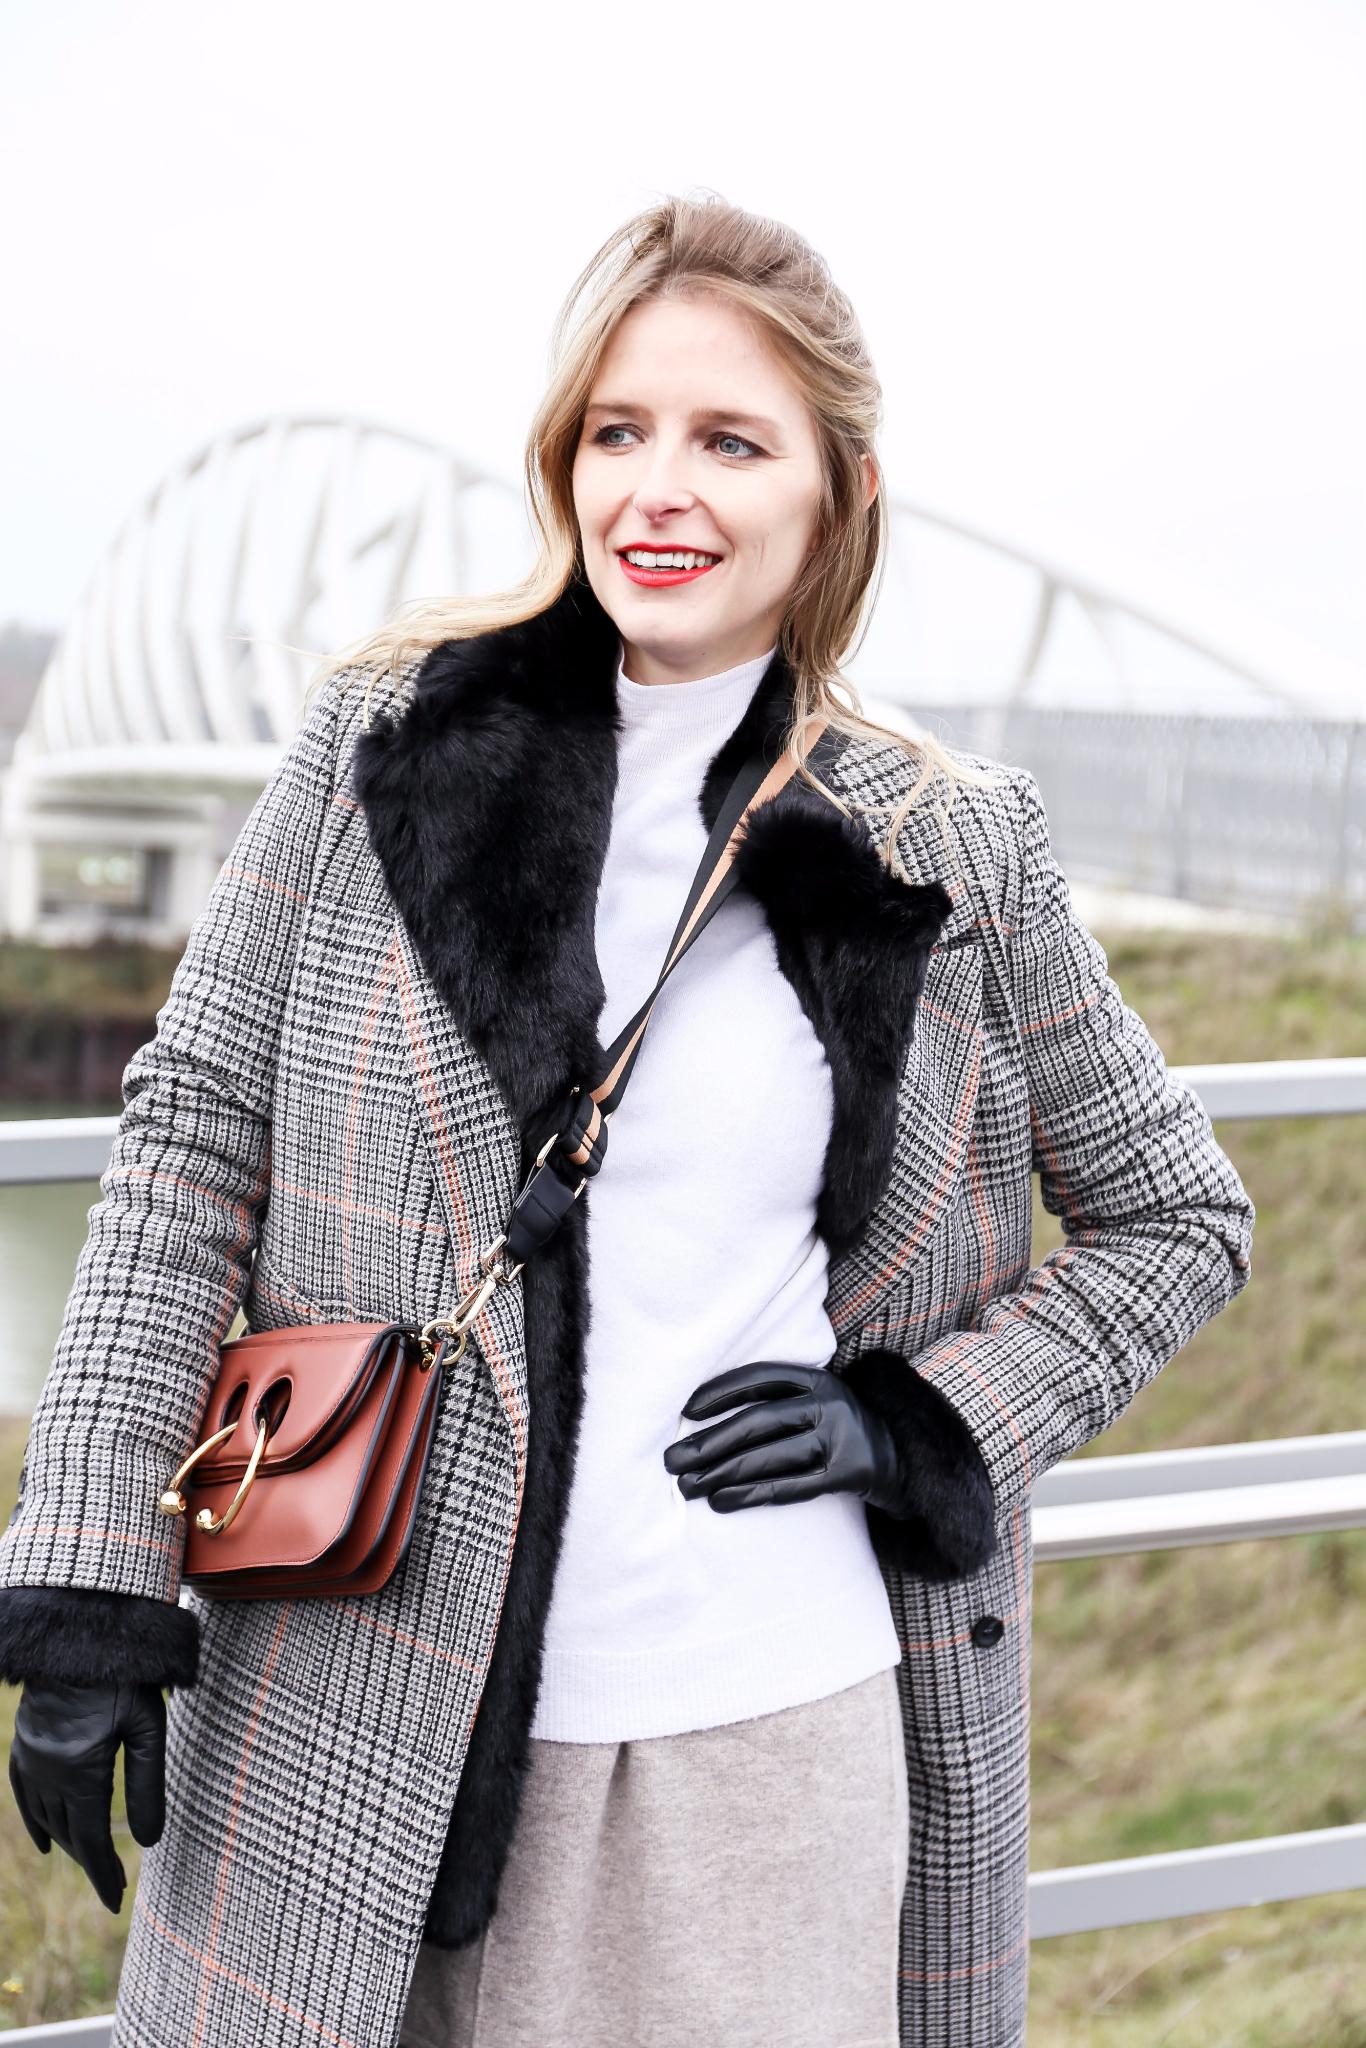 MOD-by-Monique-Fashion-Looks-JWAnderson-meets-Glencheck-2